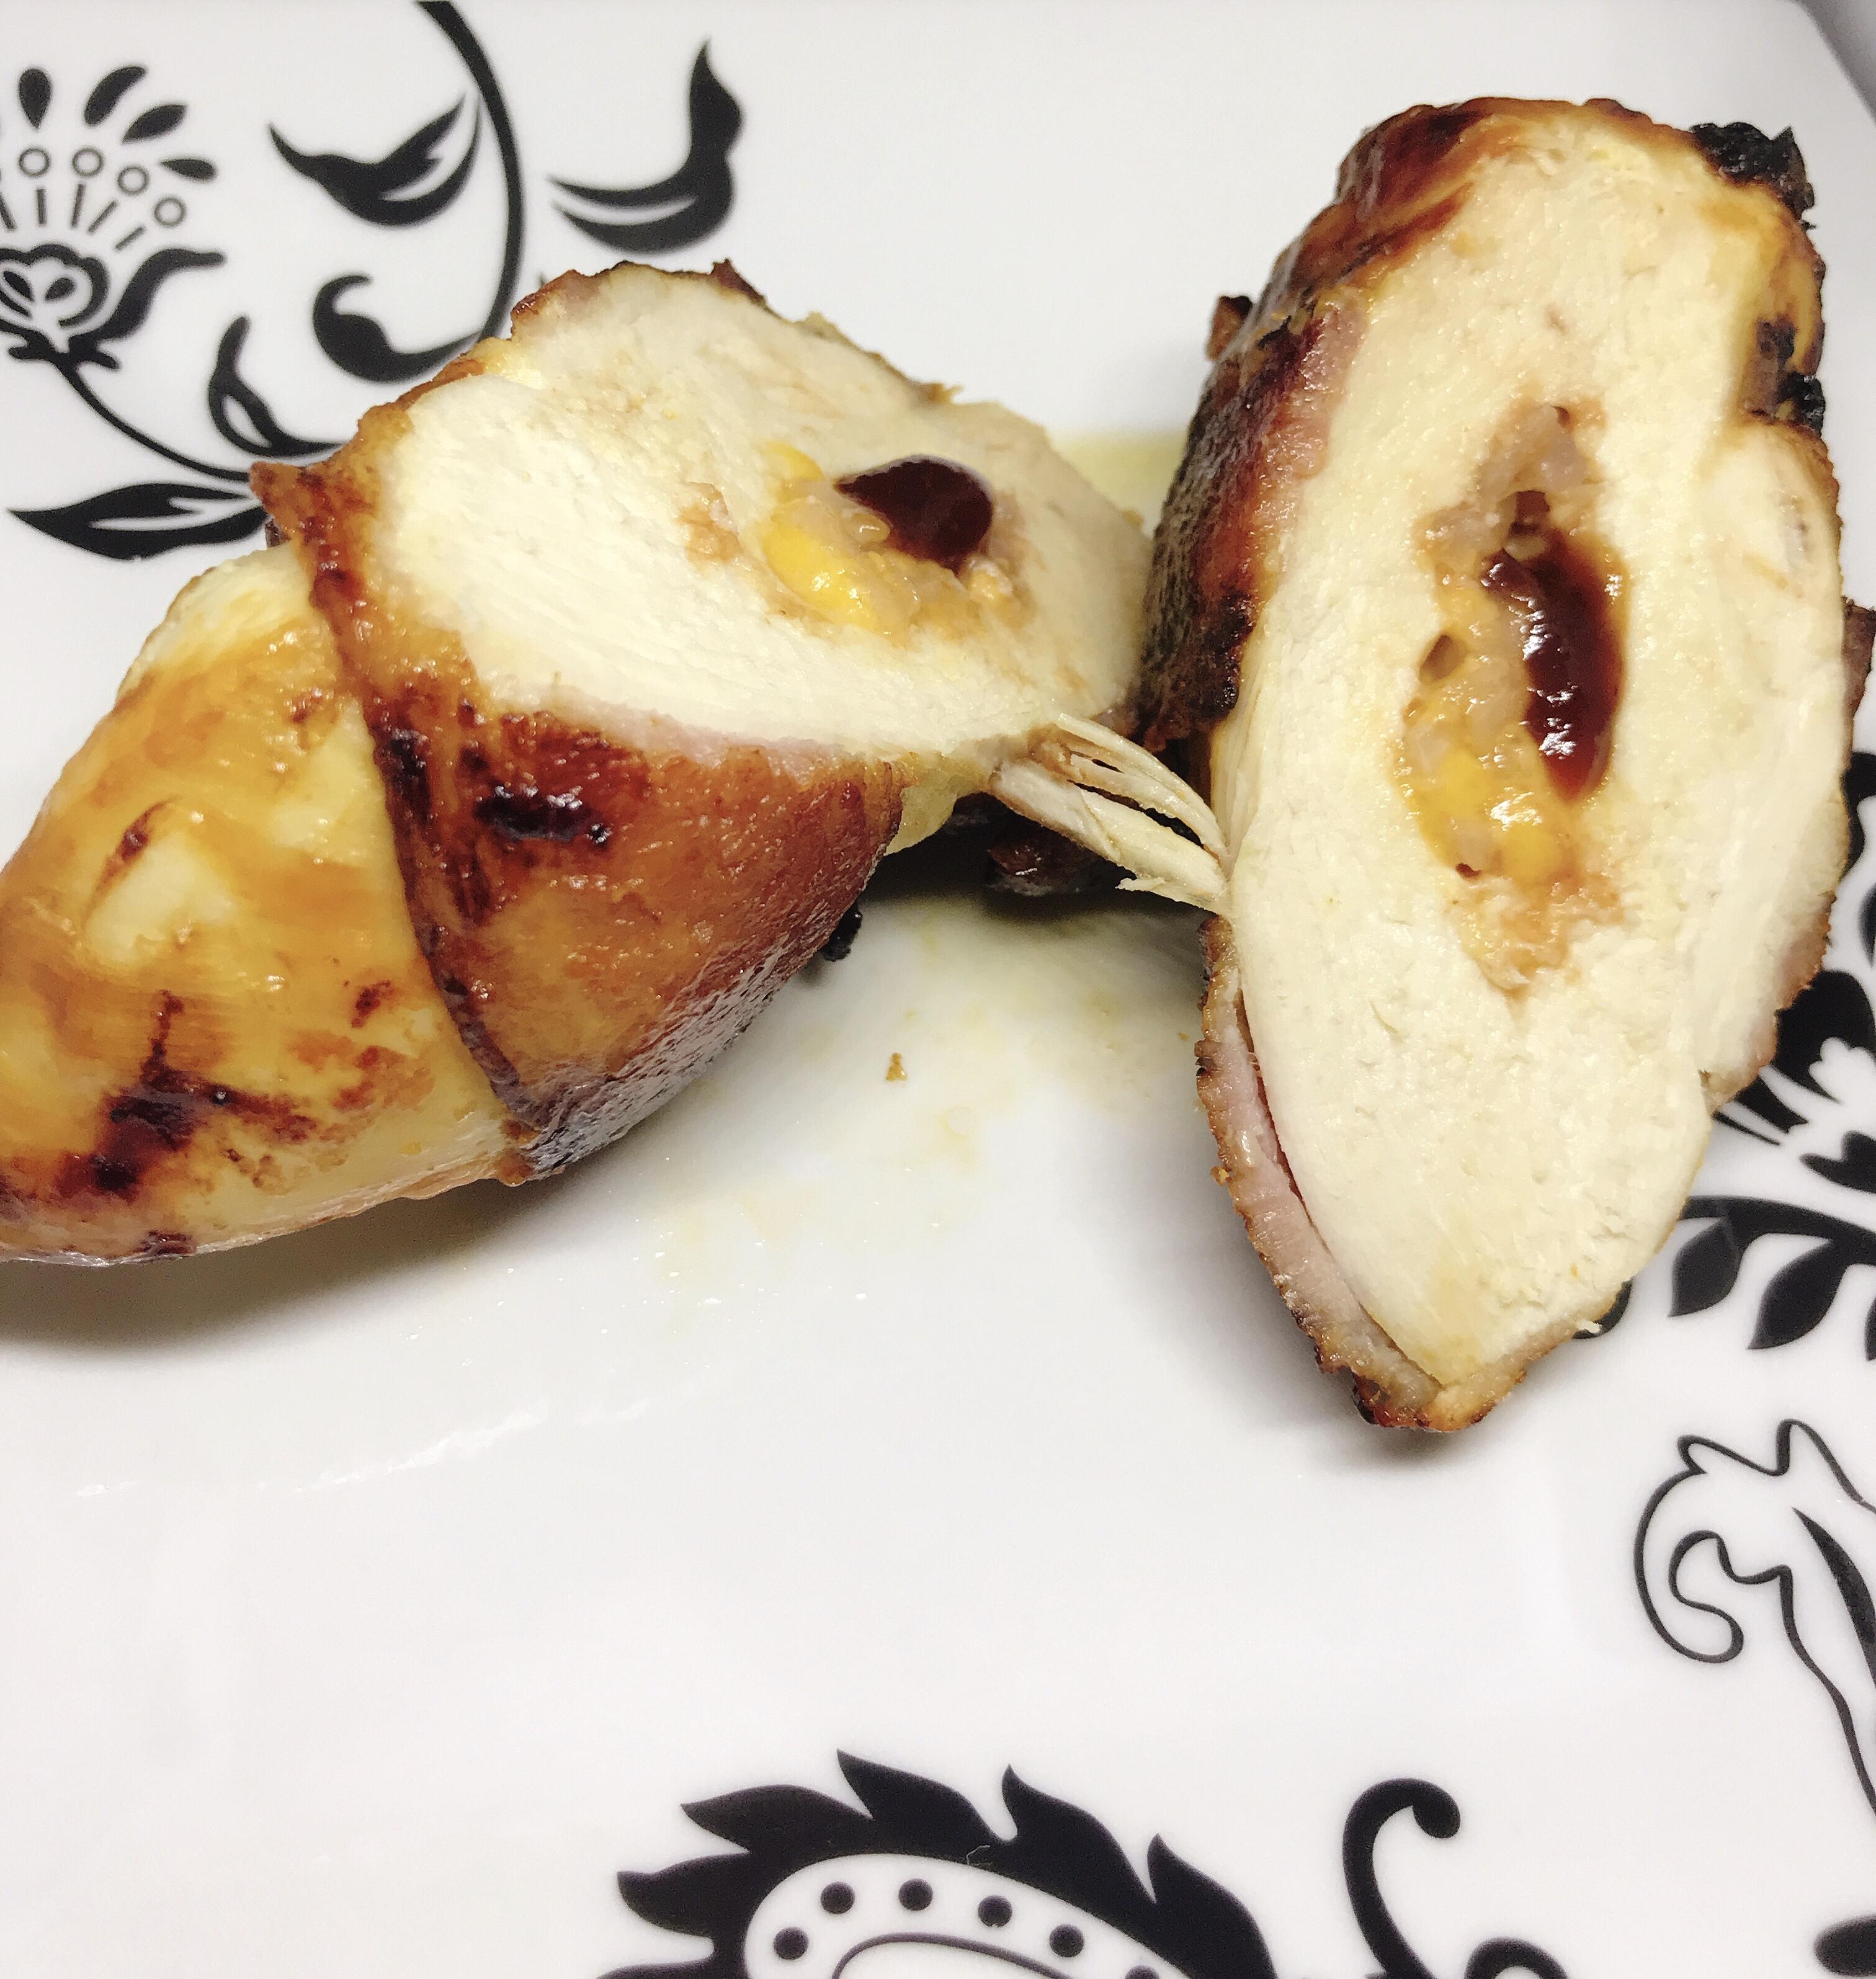 Air Fryer BBQ Cheddar-Stuffed Chicken Breasts thedailygourmet